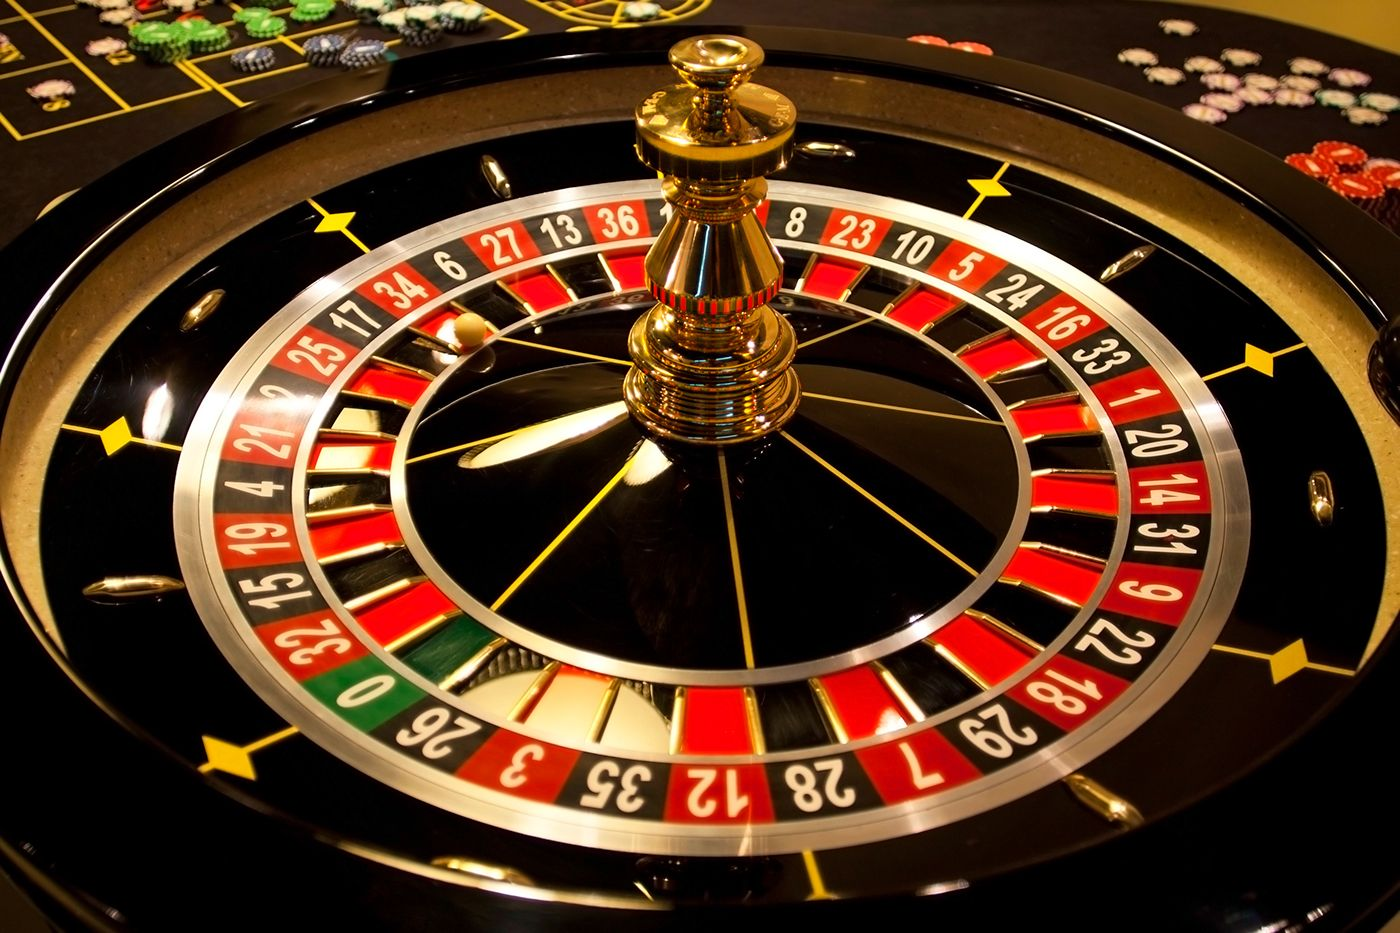 Genting casino logos